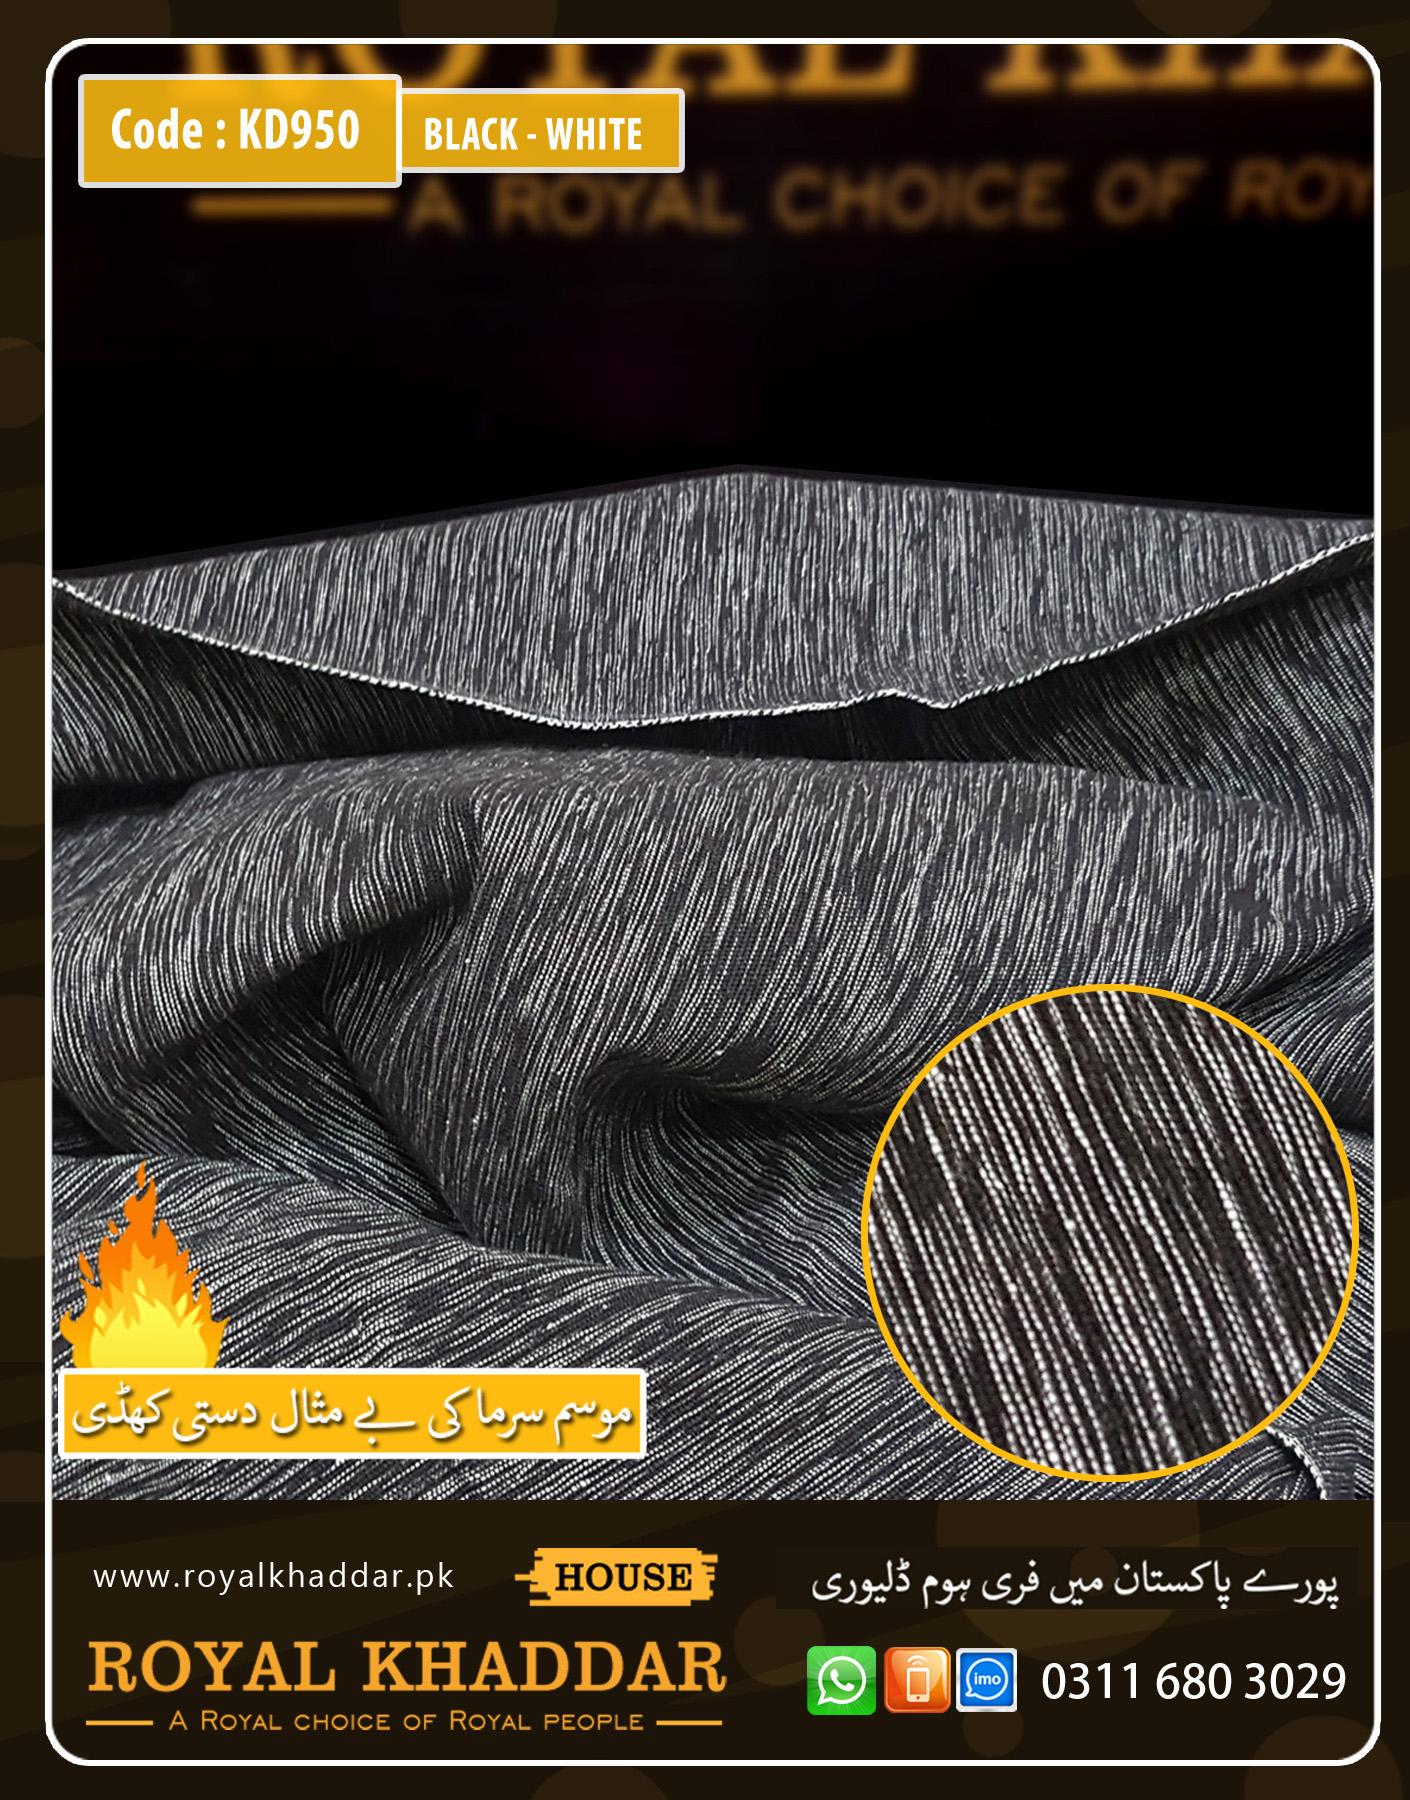 Black - White Handmade Khaddi